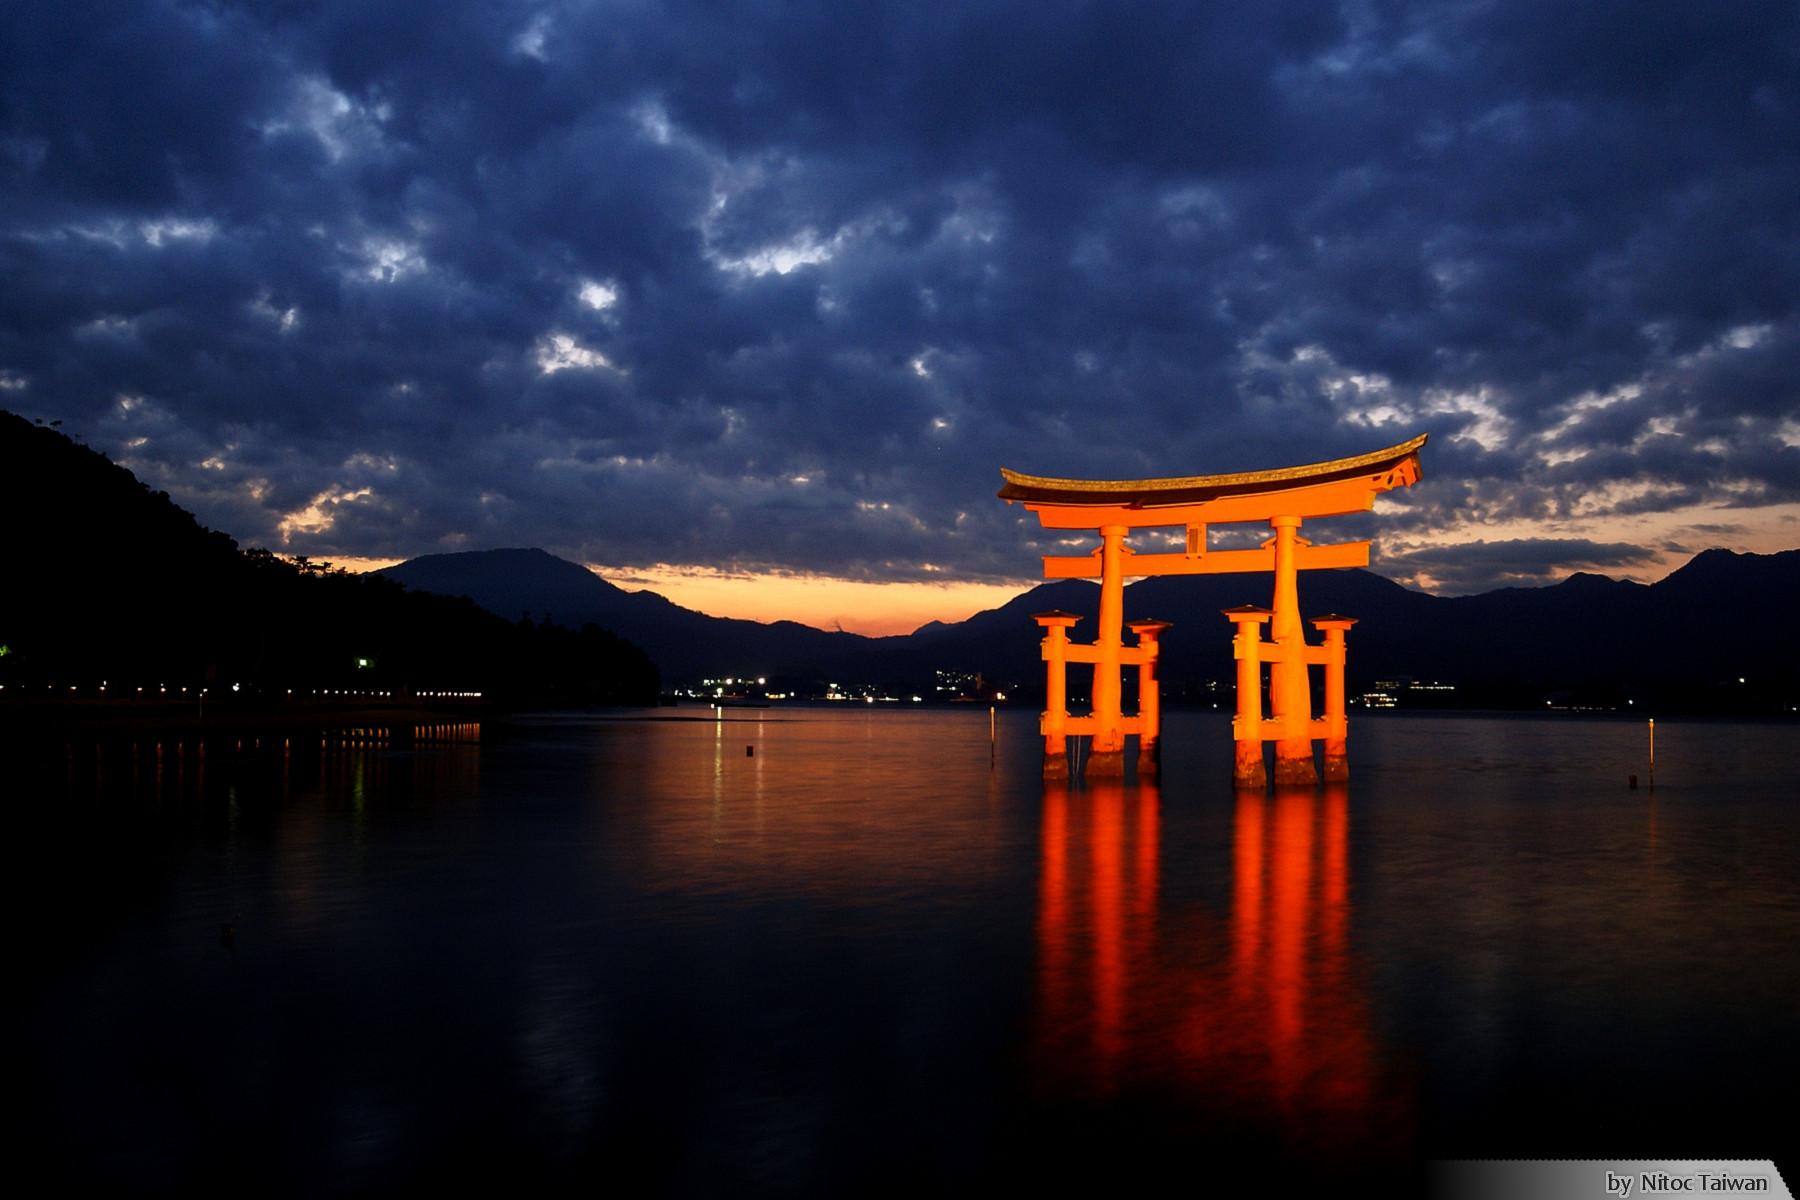 5 Tempat Hits di Jepang, Ada Spot Instagramable hingga Kota Unik Tempo Dulu